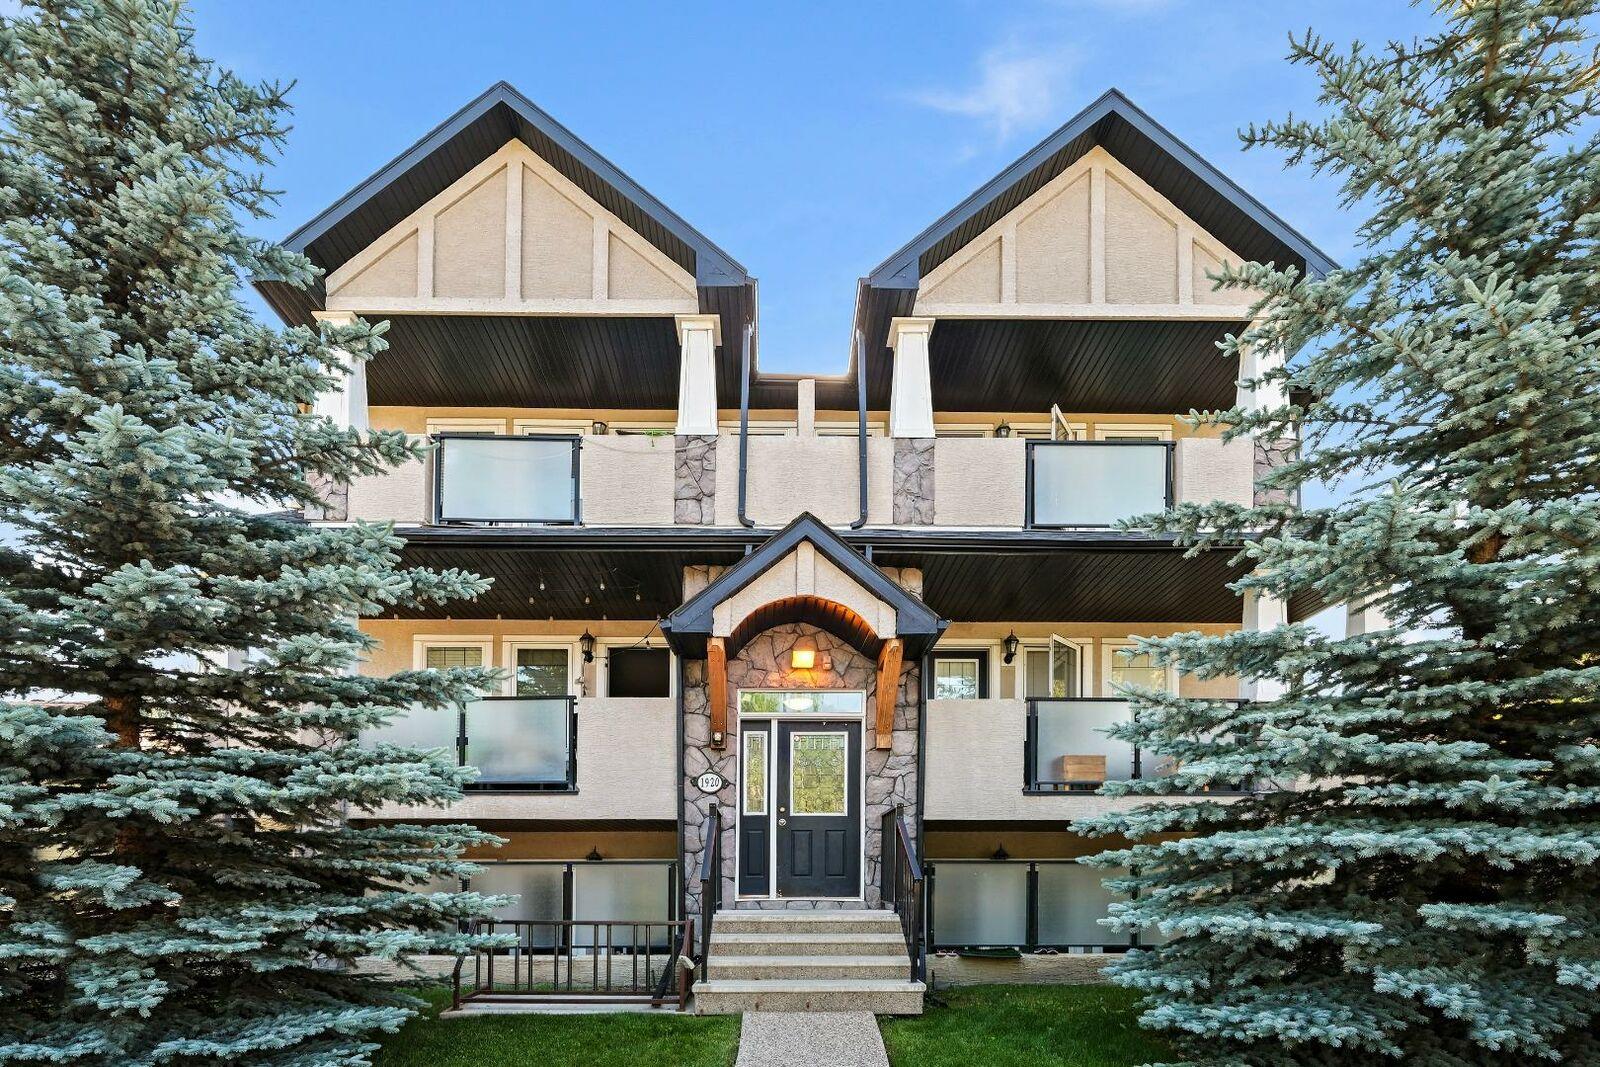 cheapest real estate Calgary